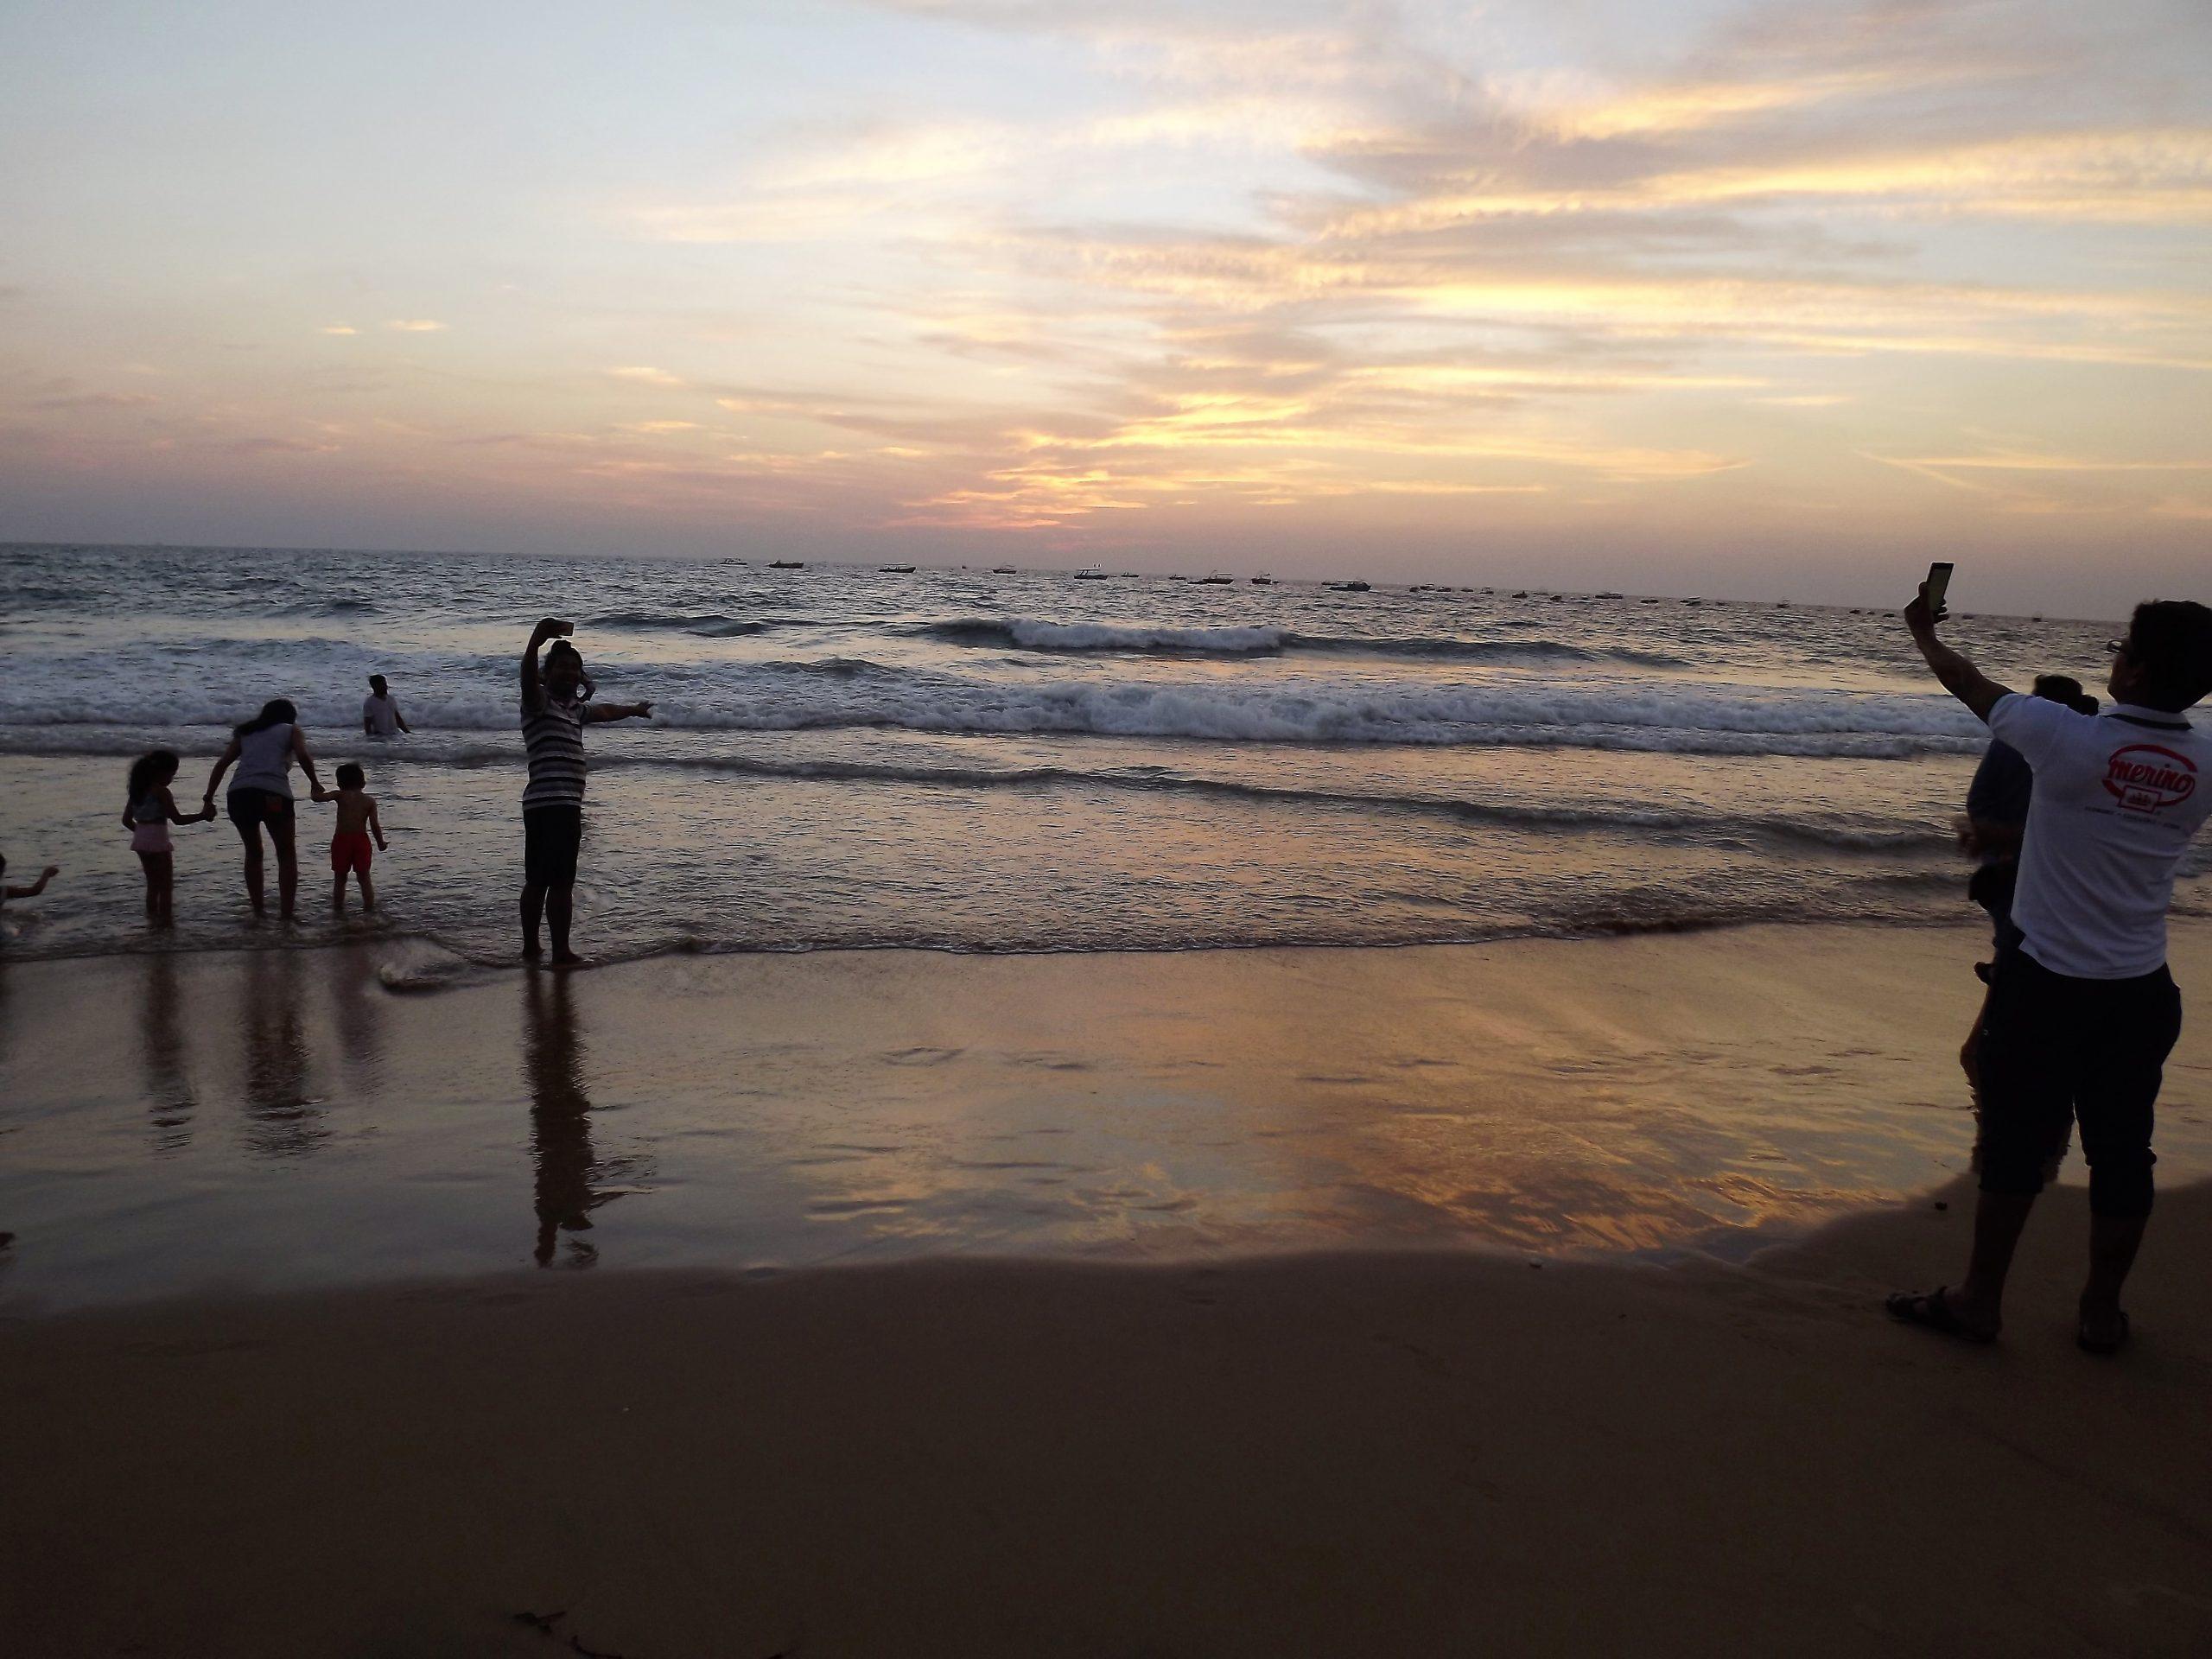 Visitors enjoying sunset at the beach